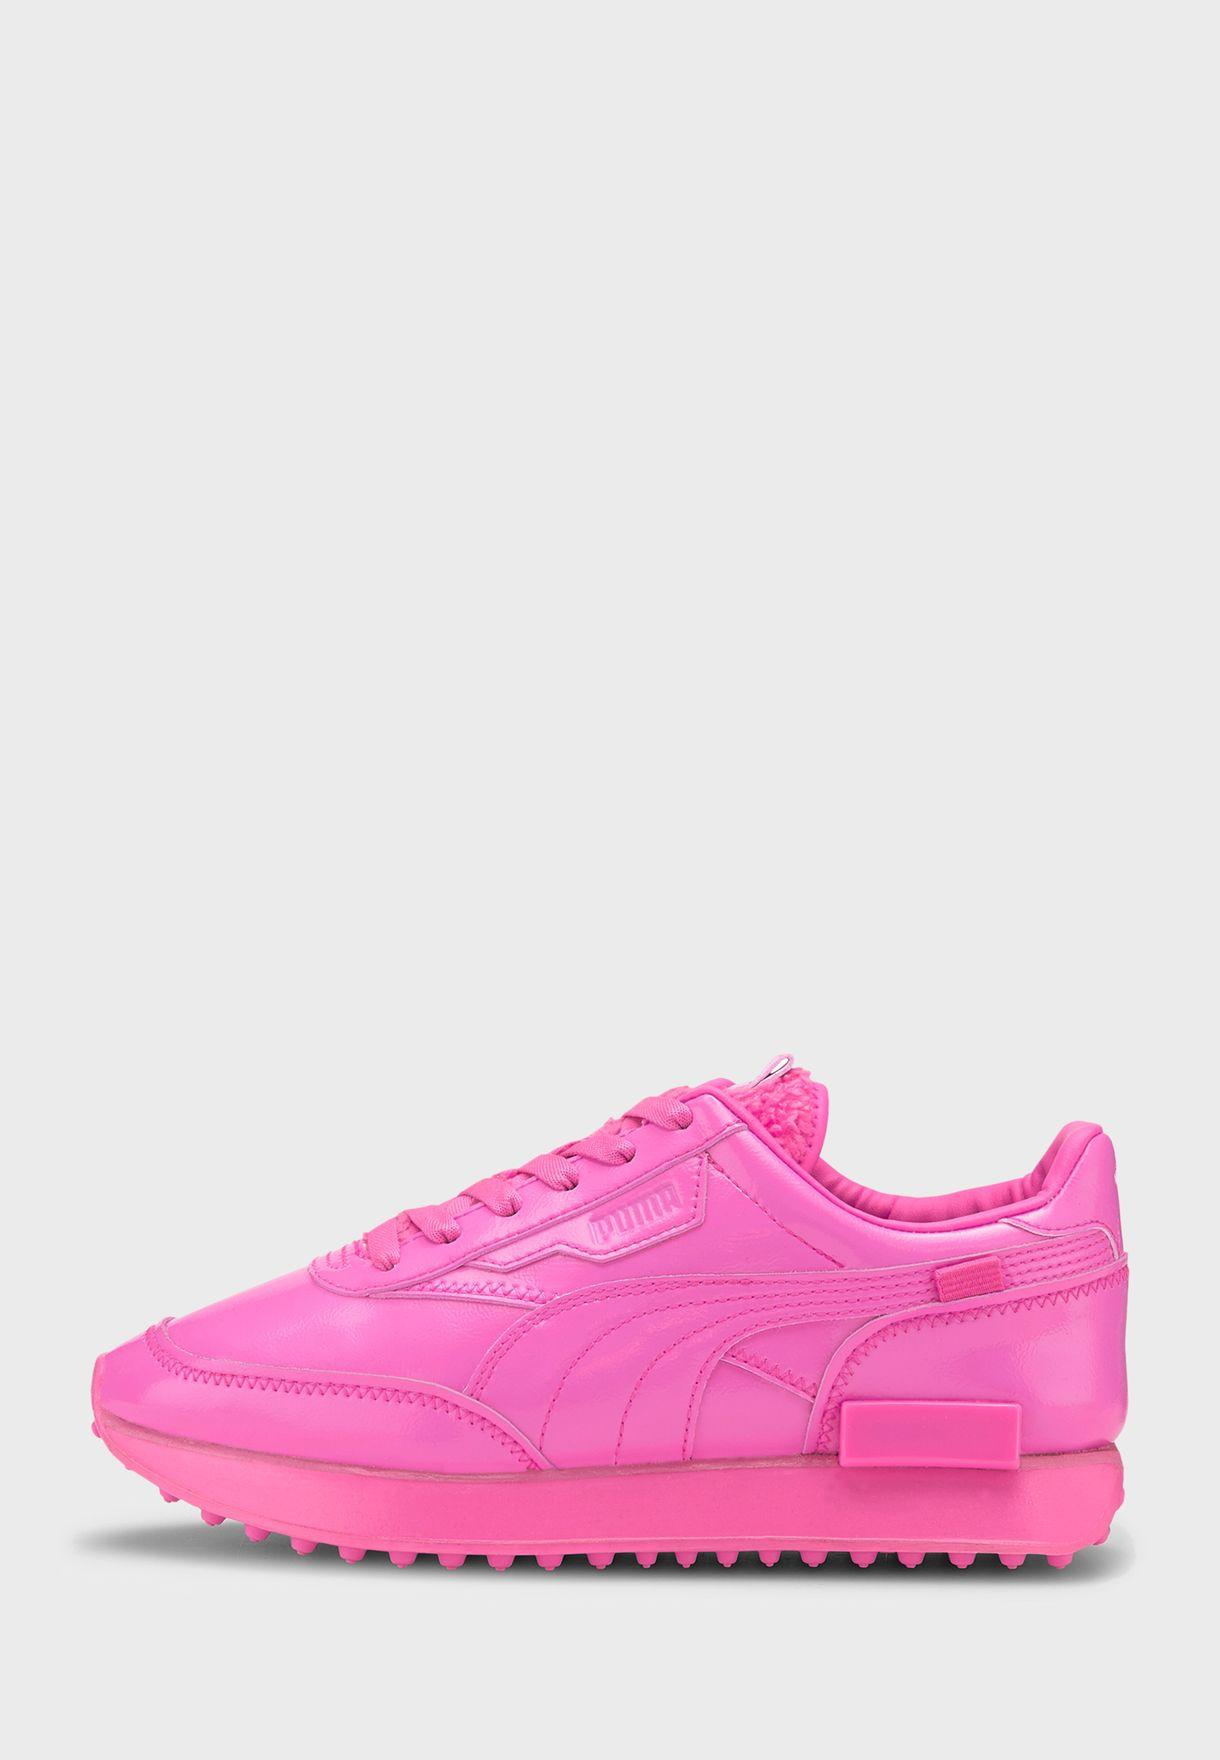 حذاء فيوتشر رايدر بي بي